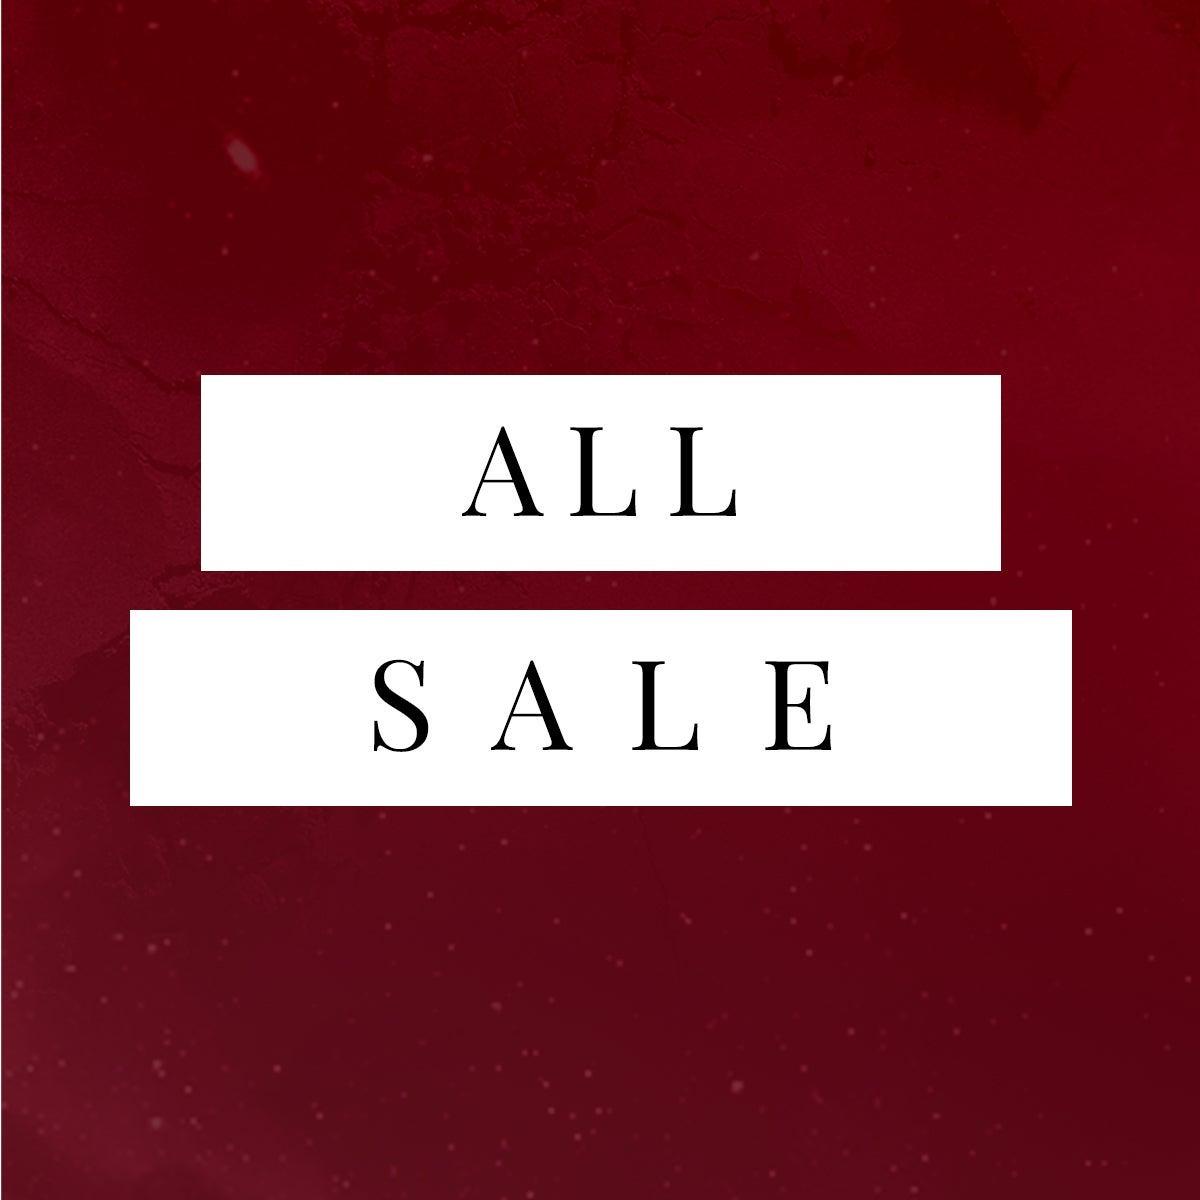 80% off brand sale